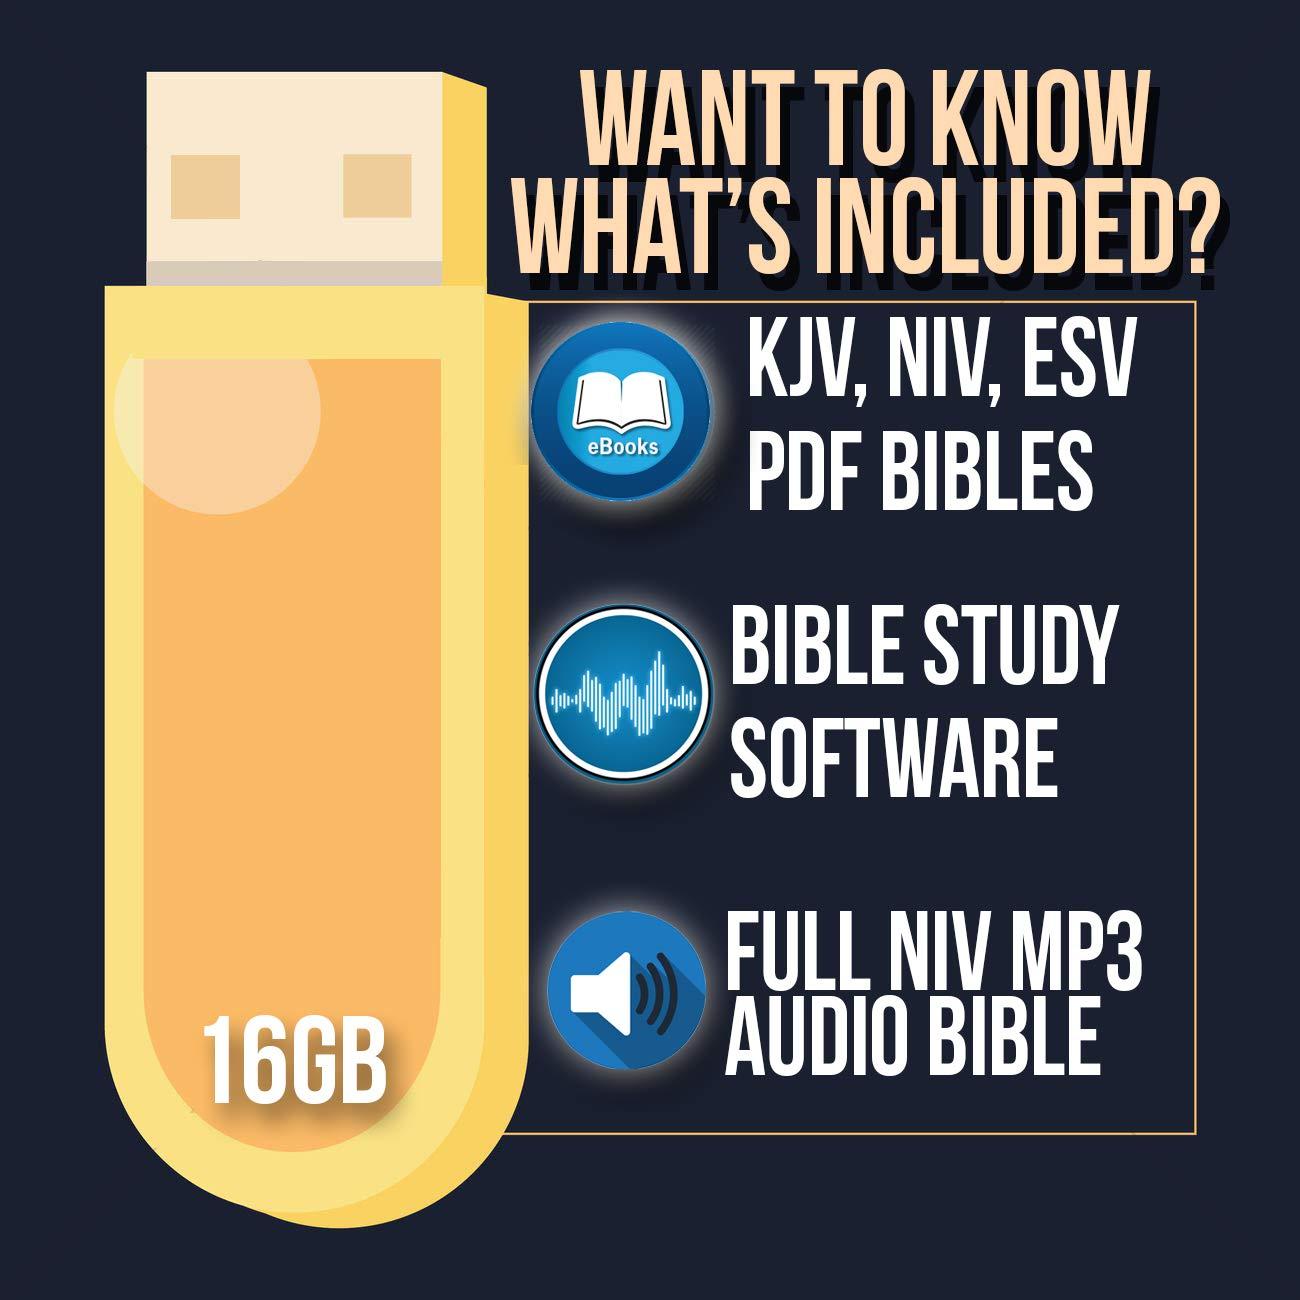 Kjv bible free download for windows xp